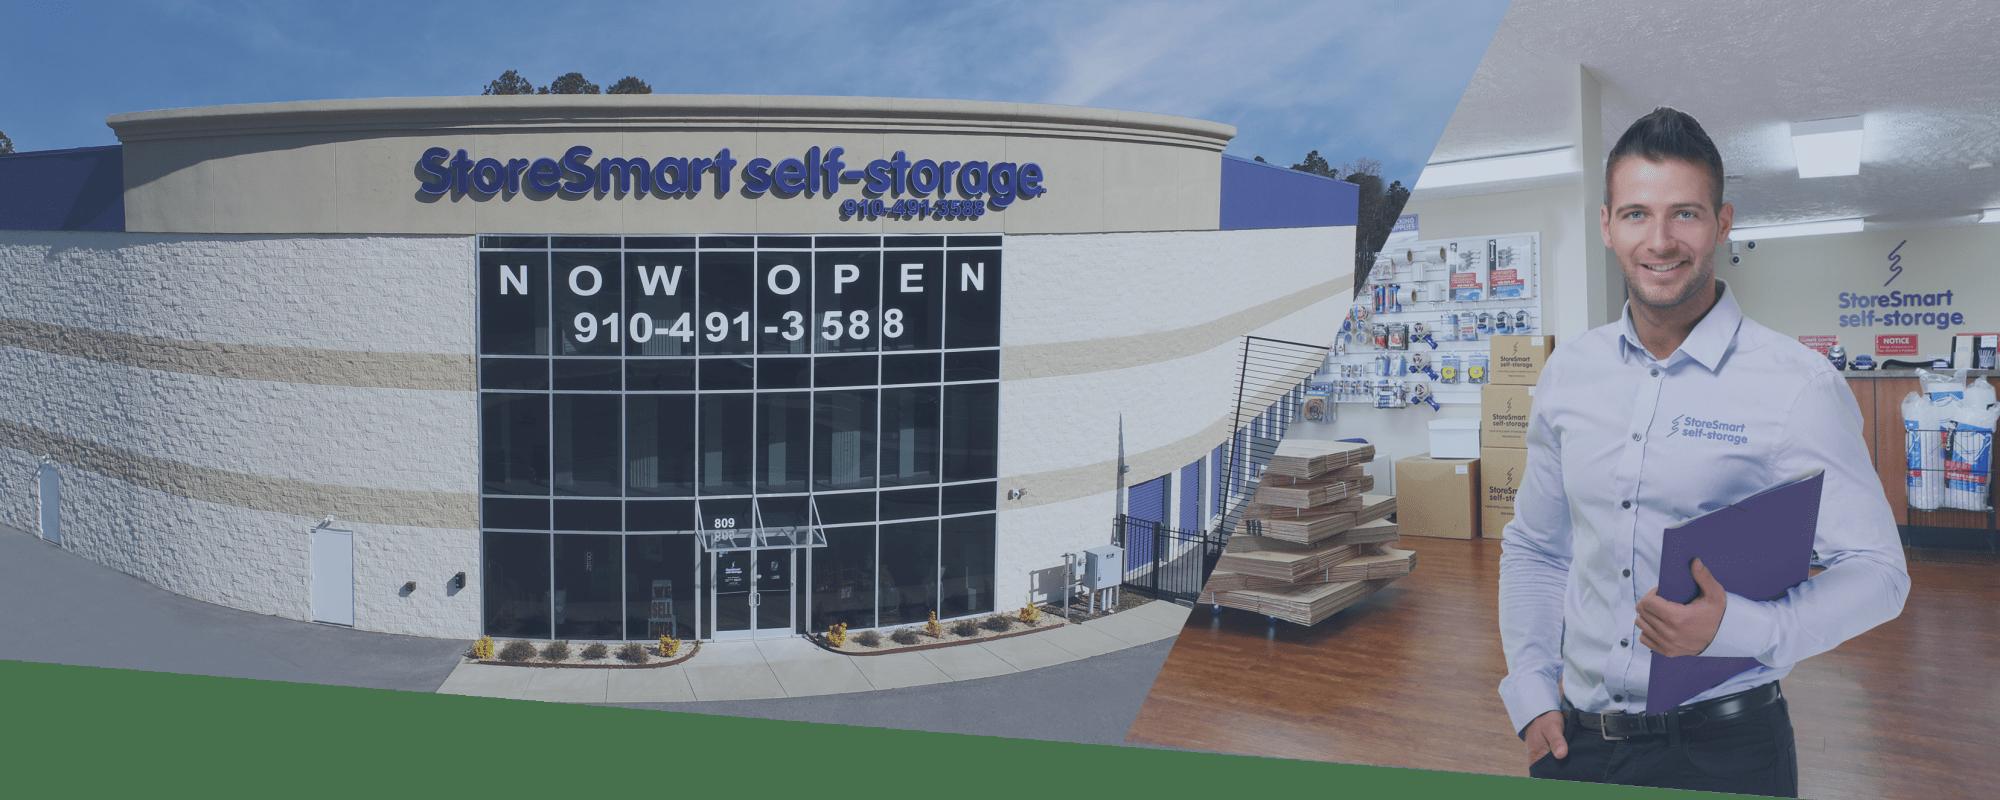 Self storage at StoreSmart Self-Storage in Spring Lake, North Carolina